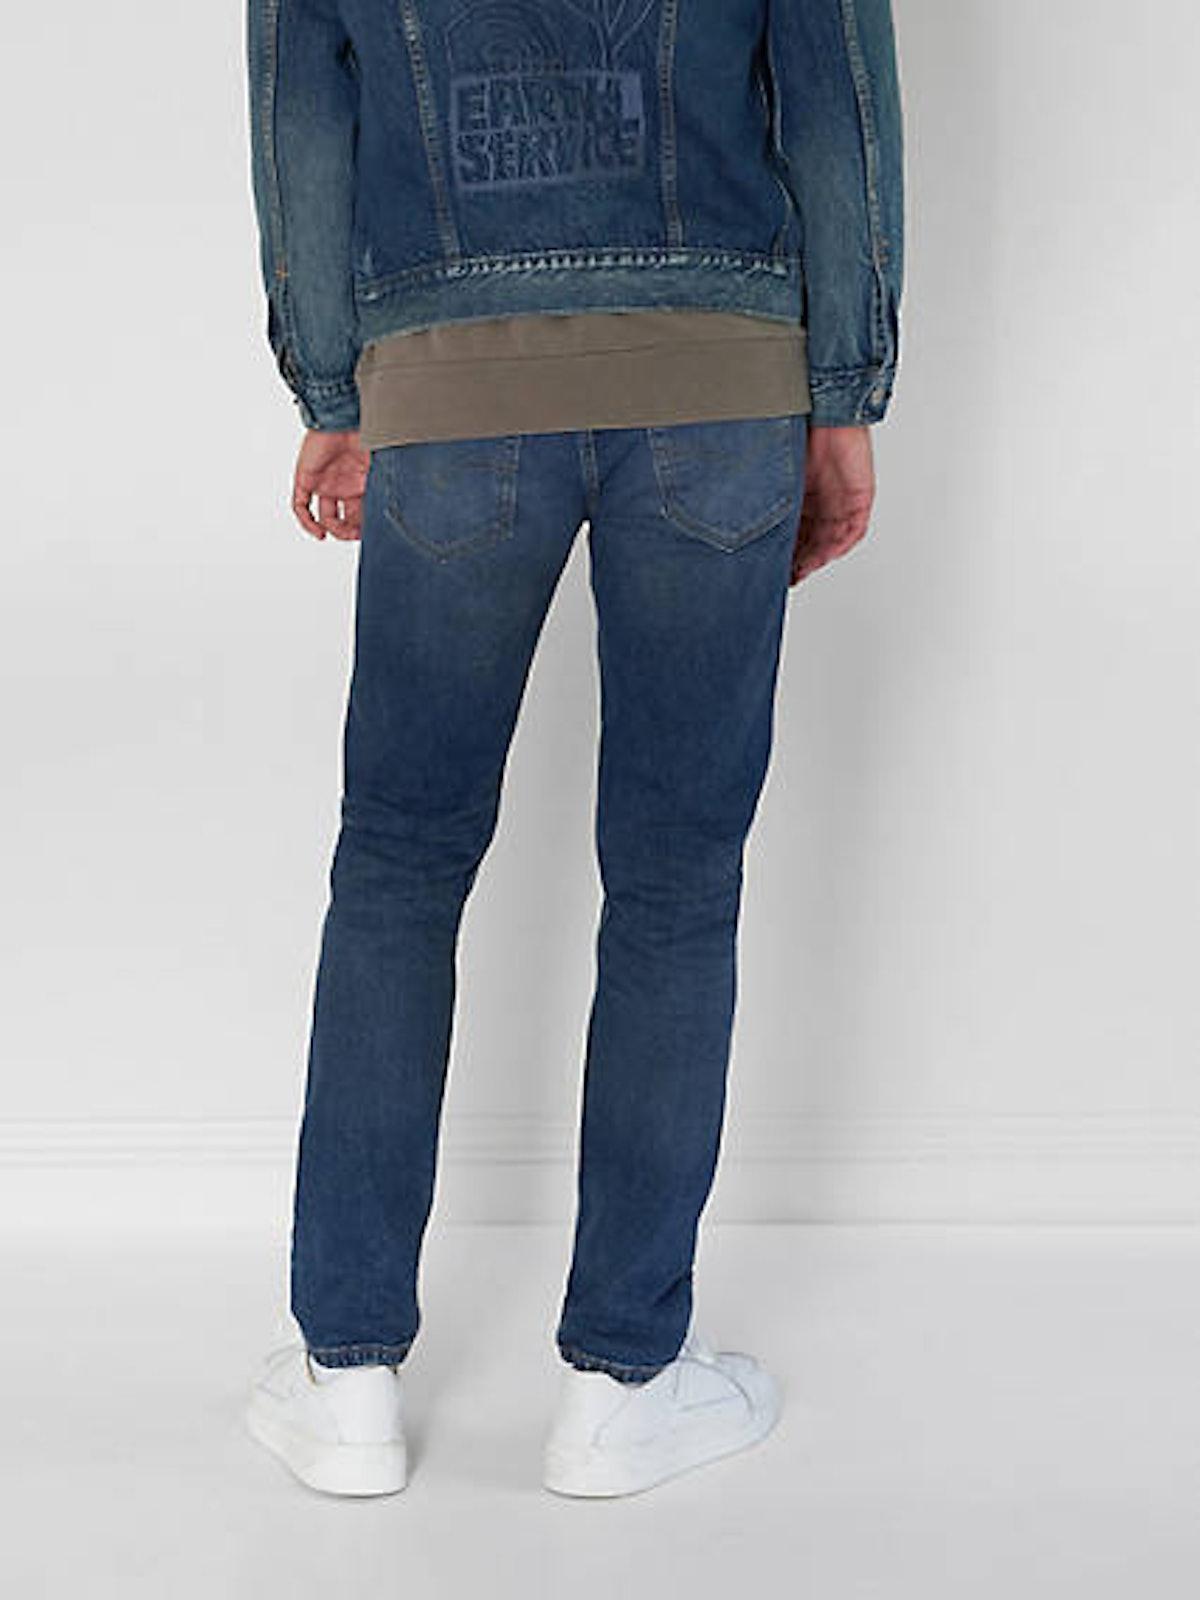 WellThread 502 Taper Fit Men's Jeans